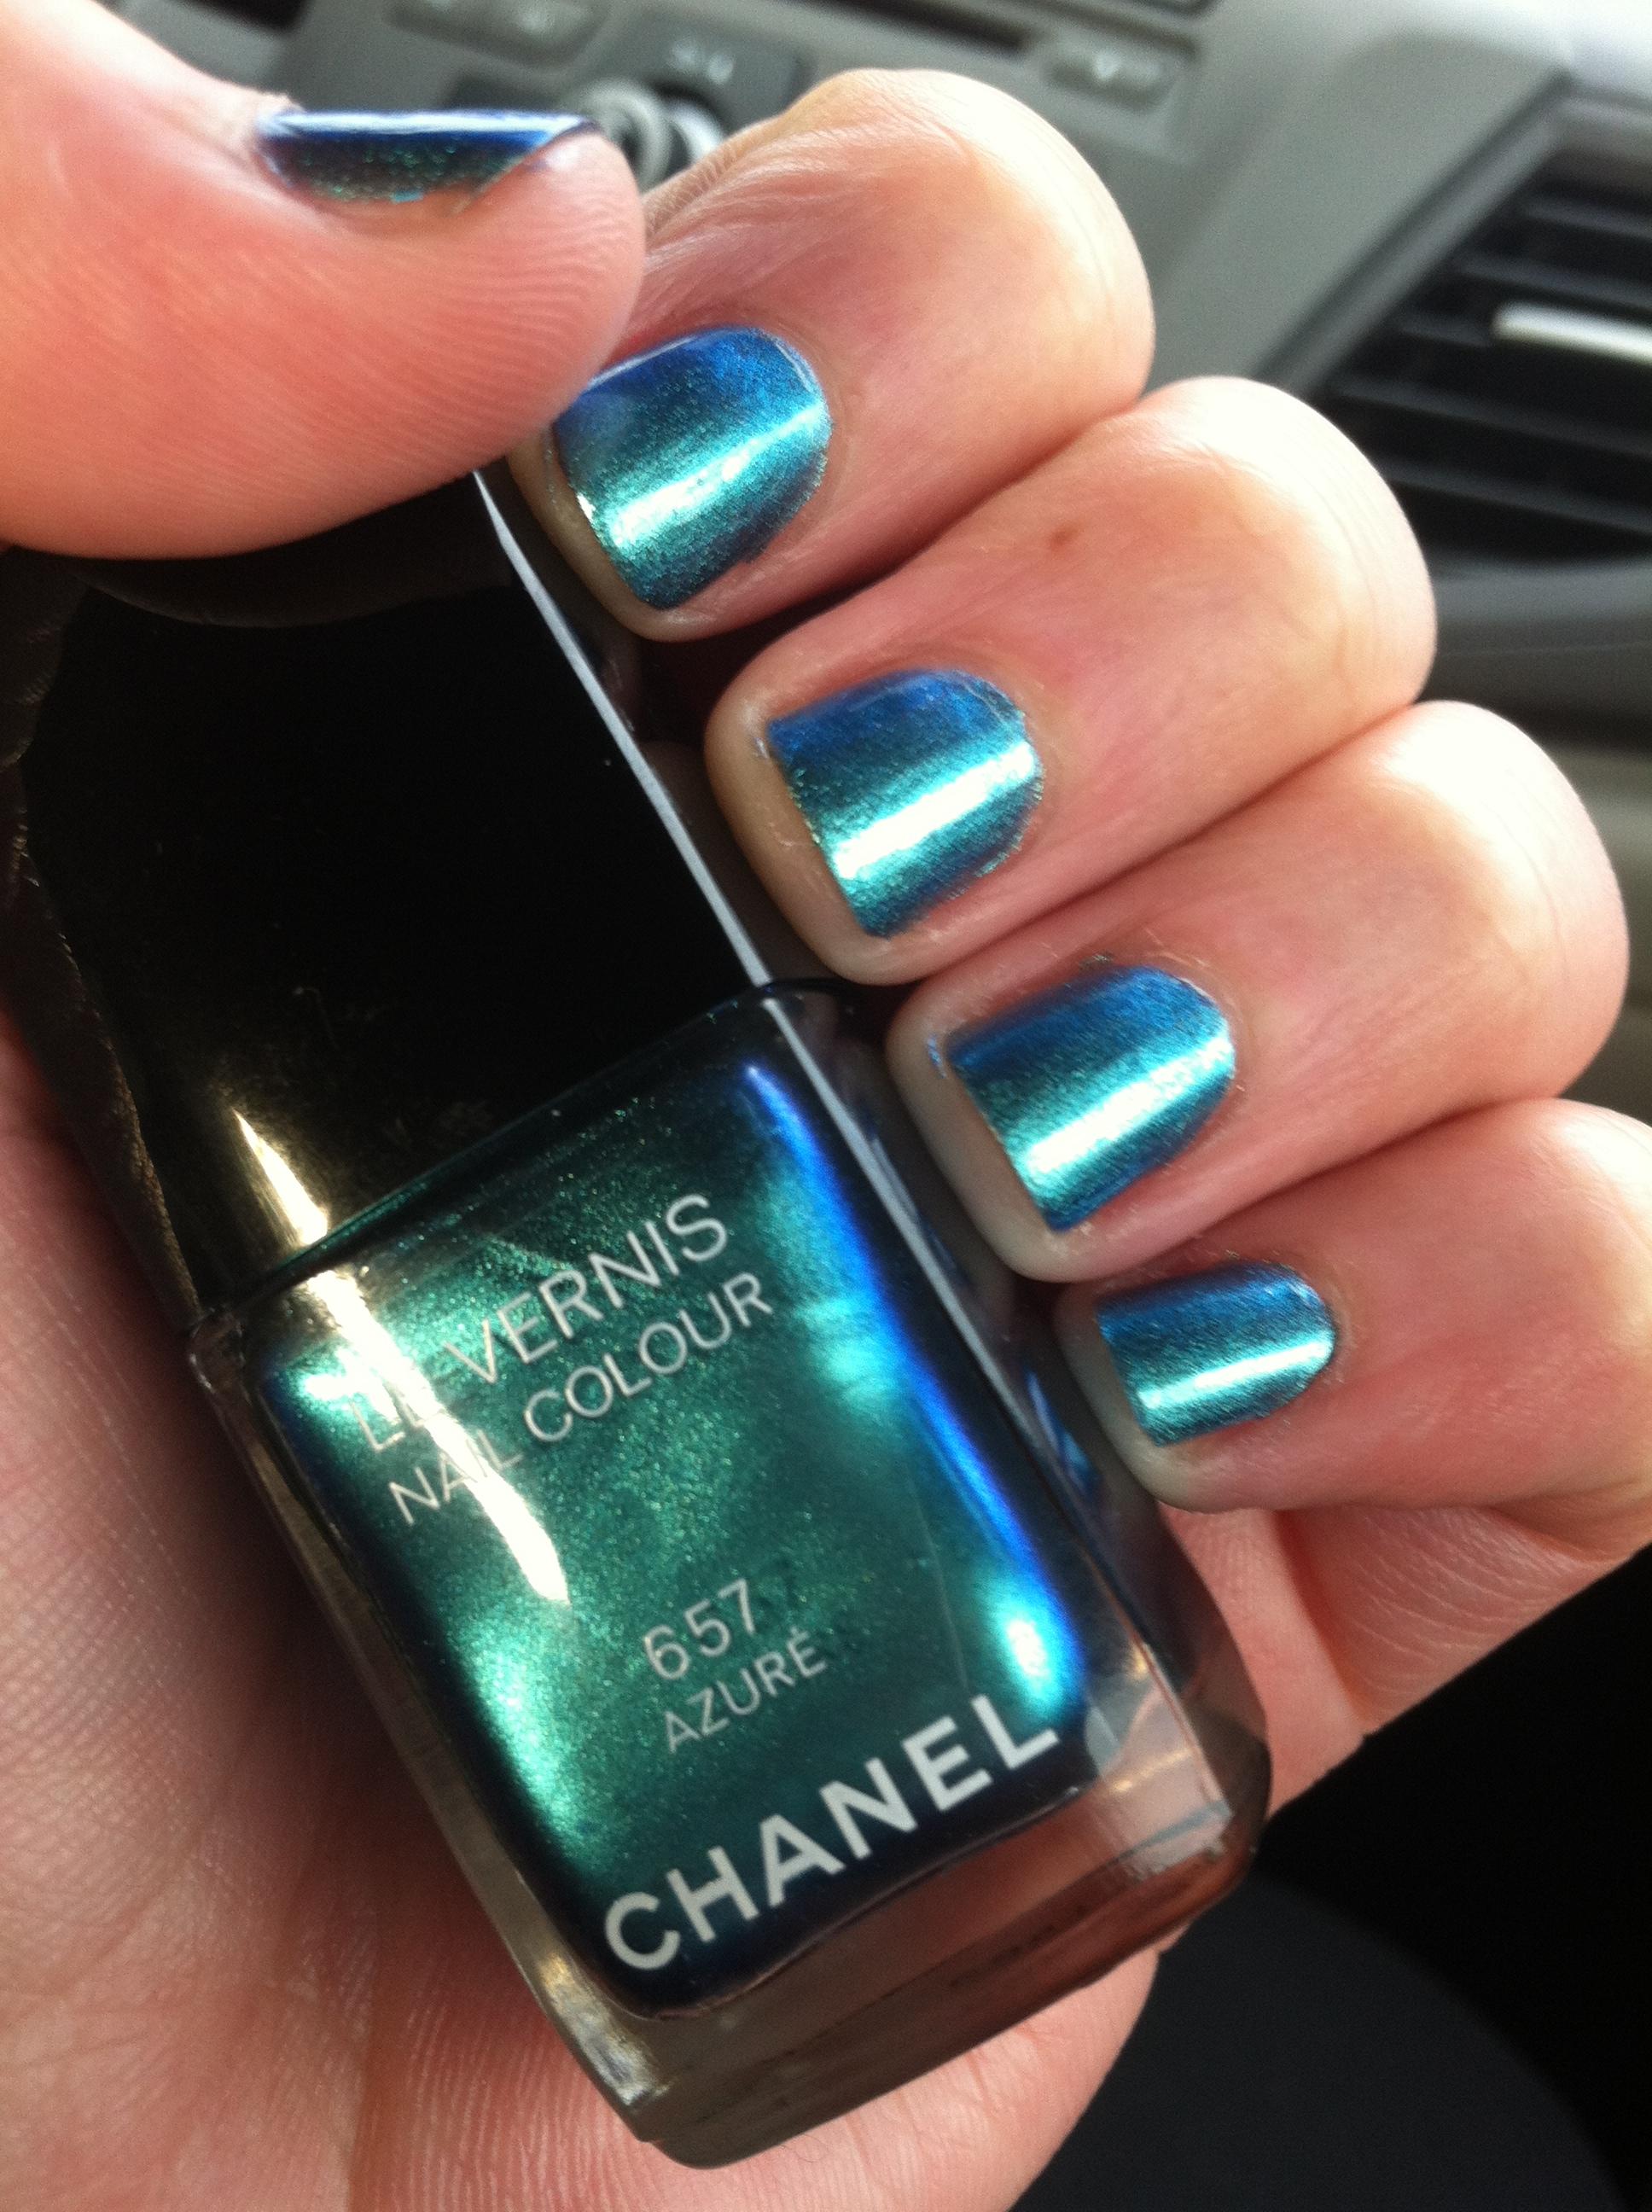 Chanel Le Vernis in Azure | Amanda Brooke Etkind